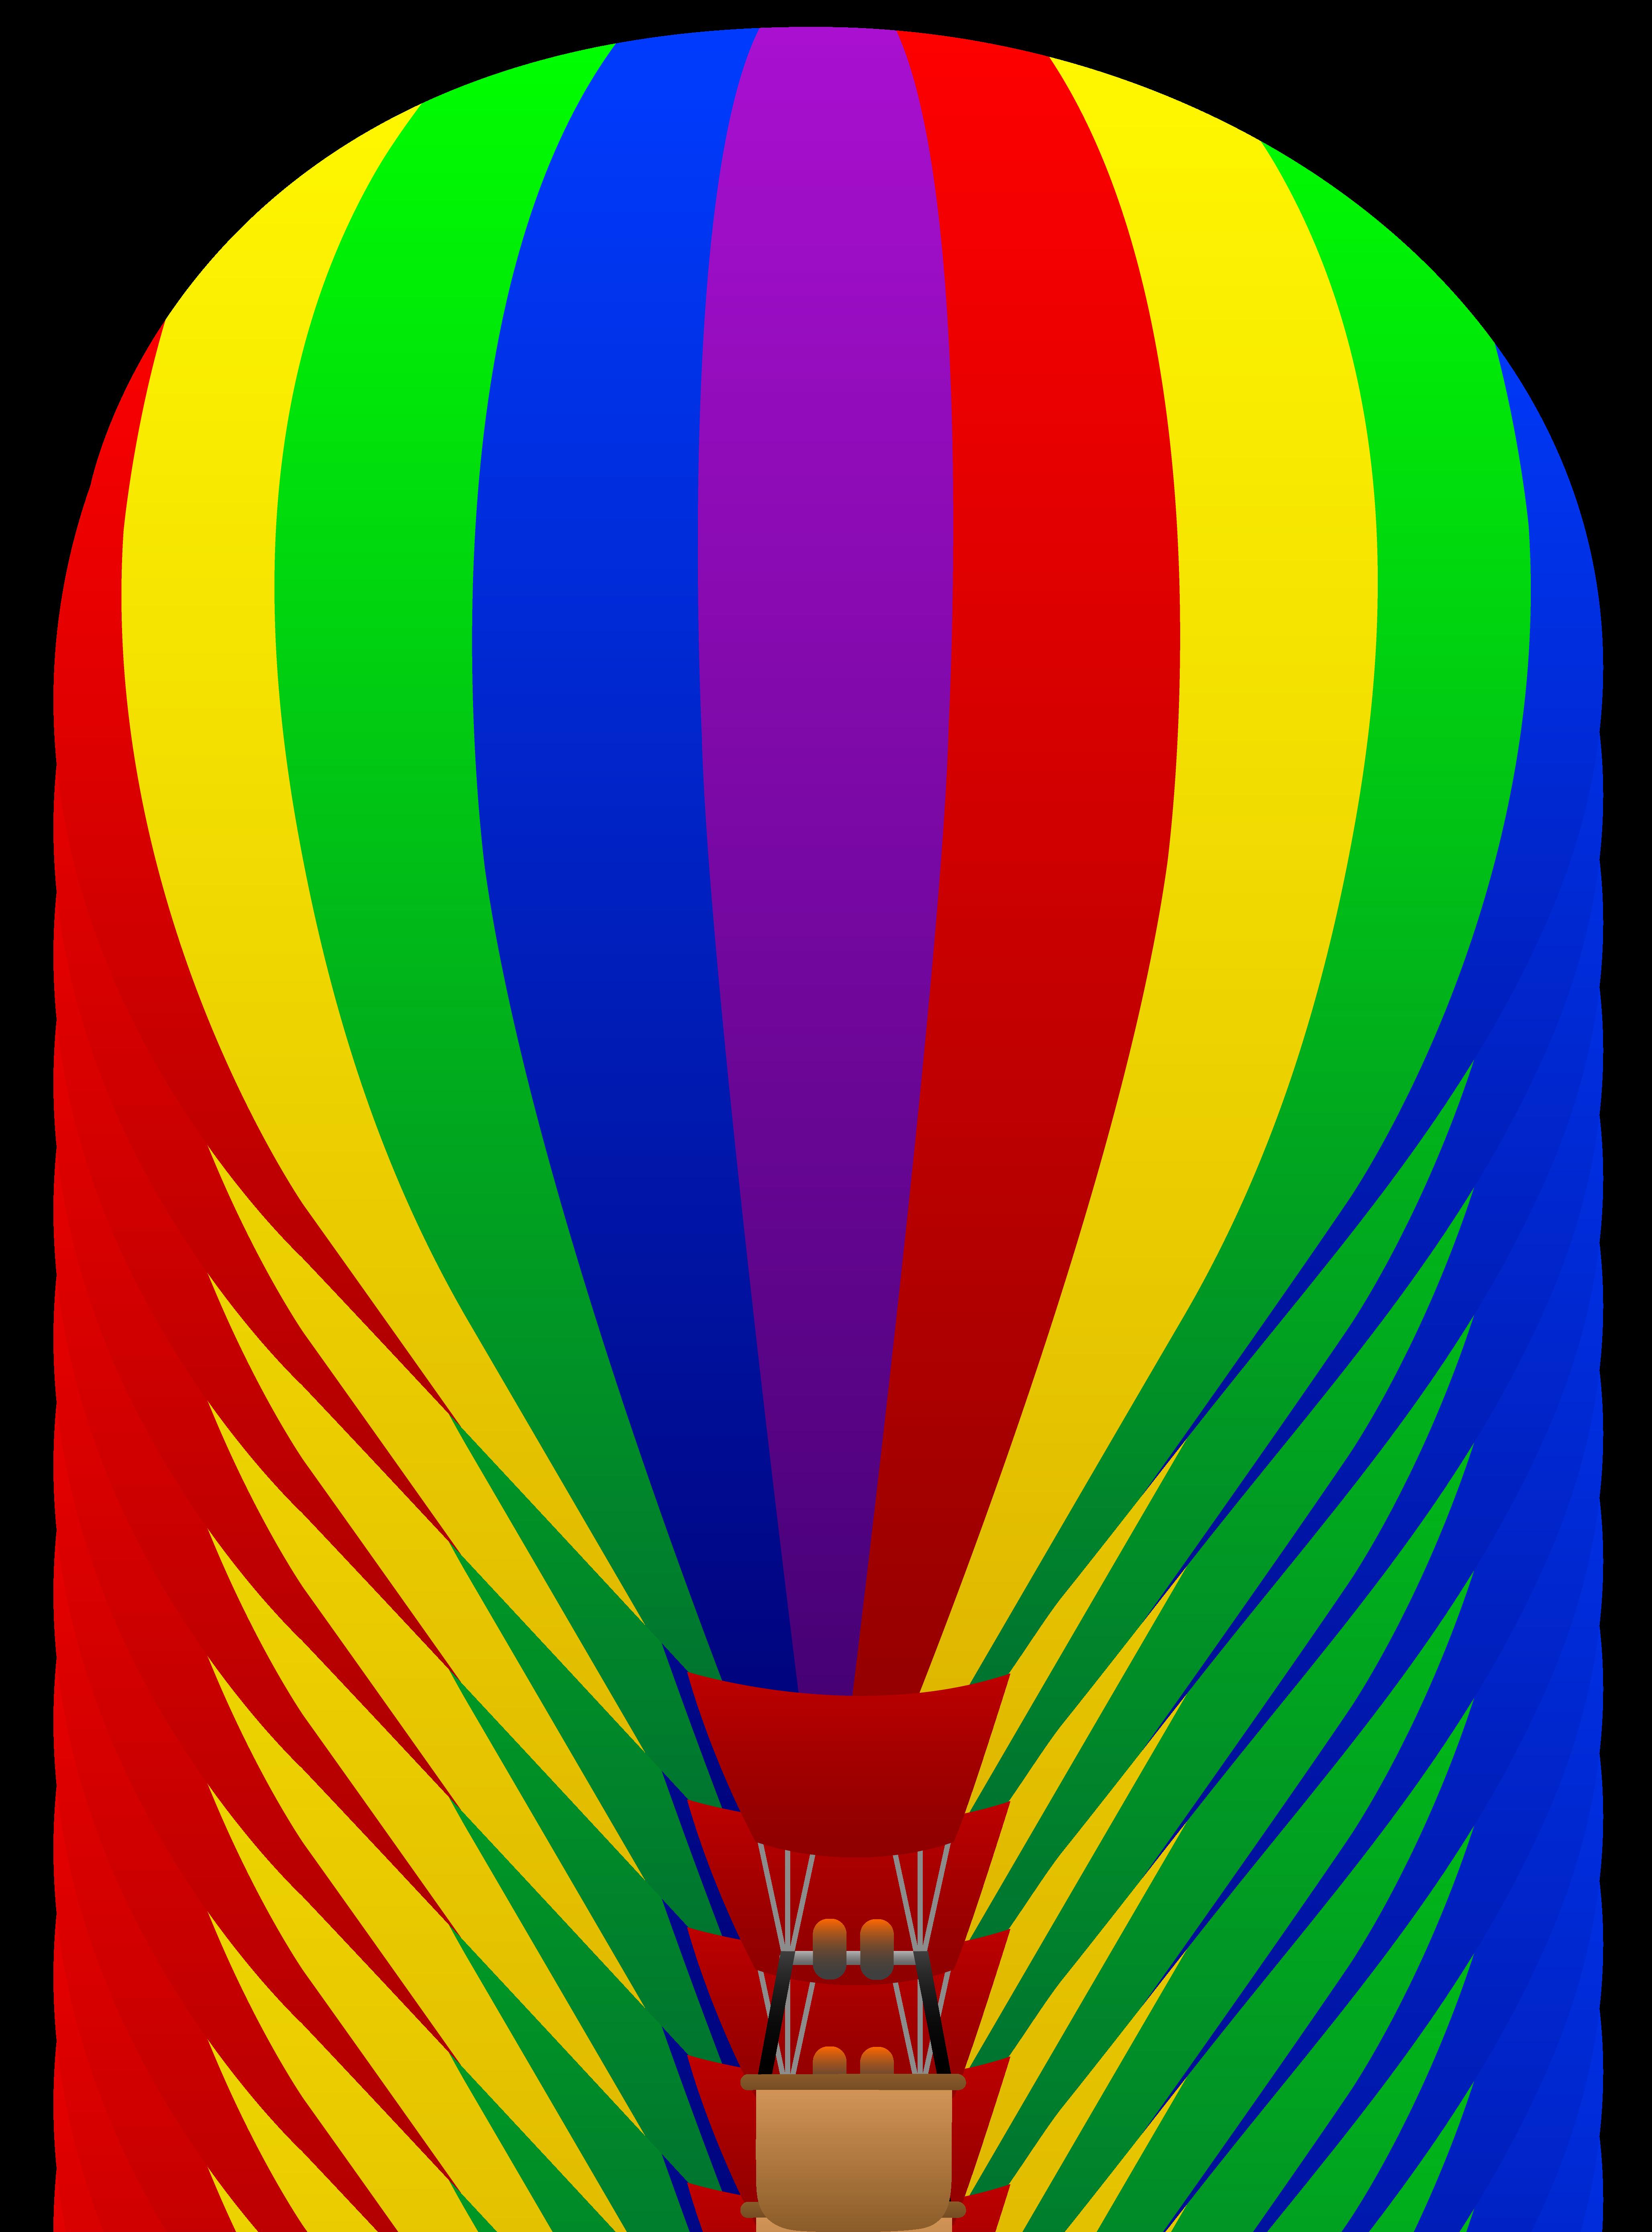 Hot Air Balloon clipart #6, Download drawings